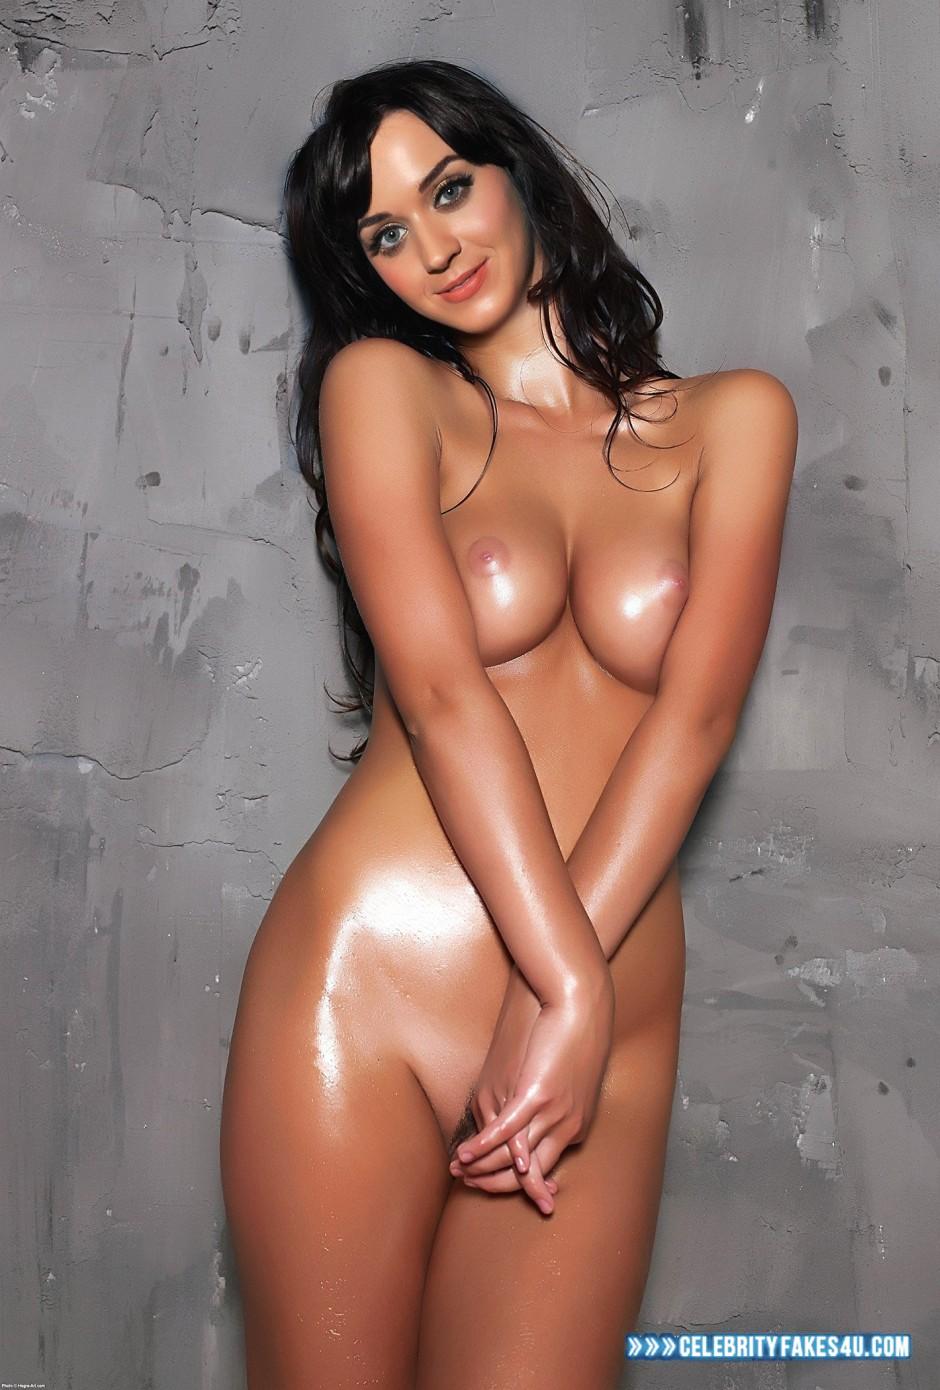 Katy perry nude shots